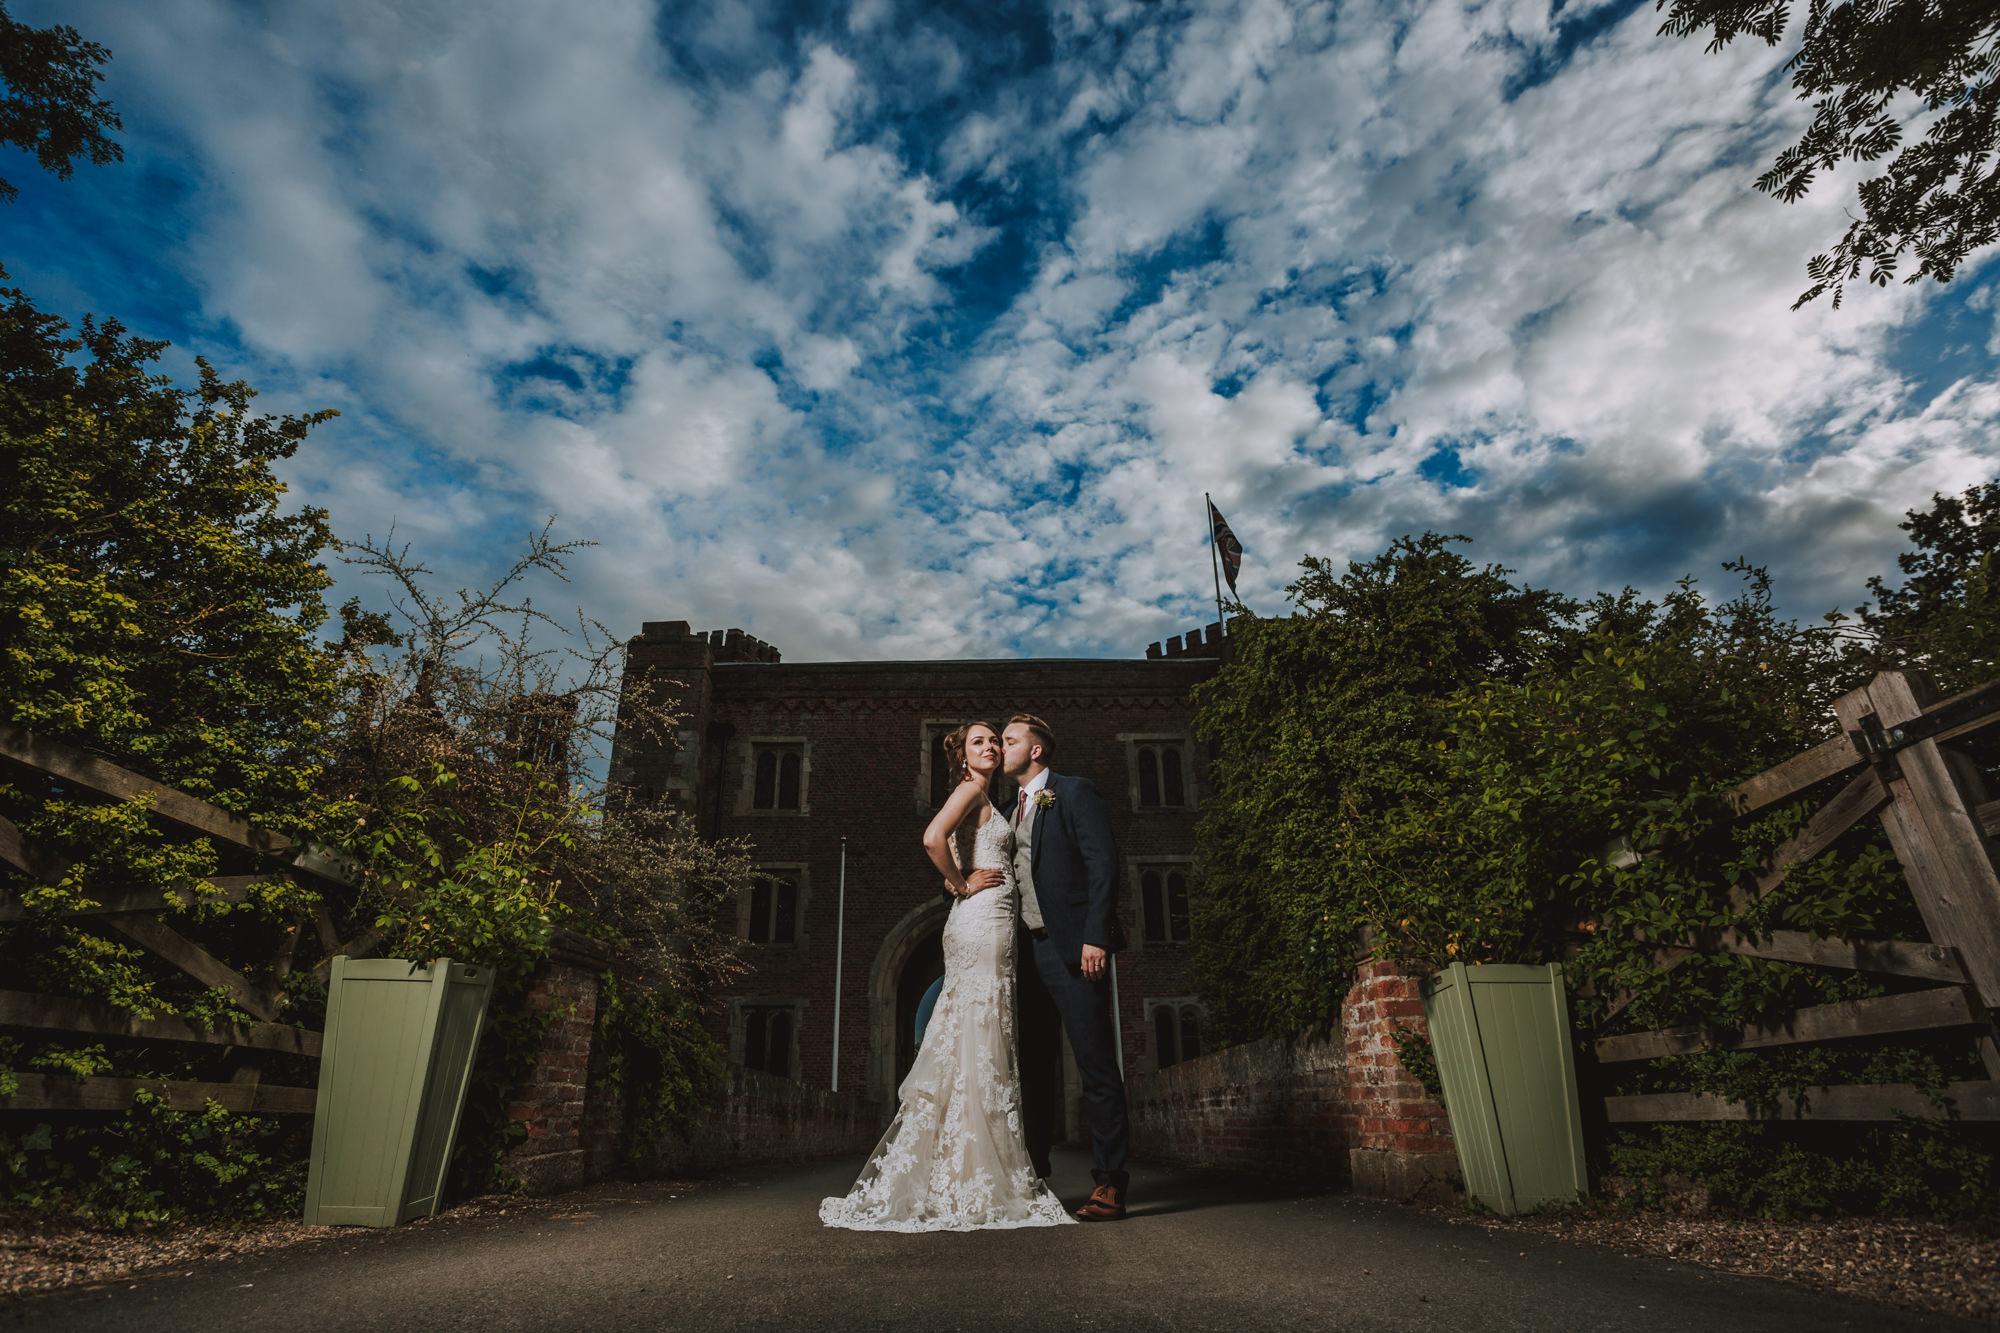 hodsock priory wedding photographers blog91.jpg